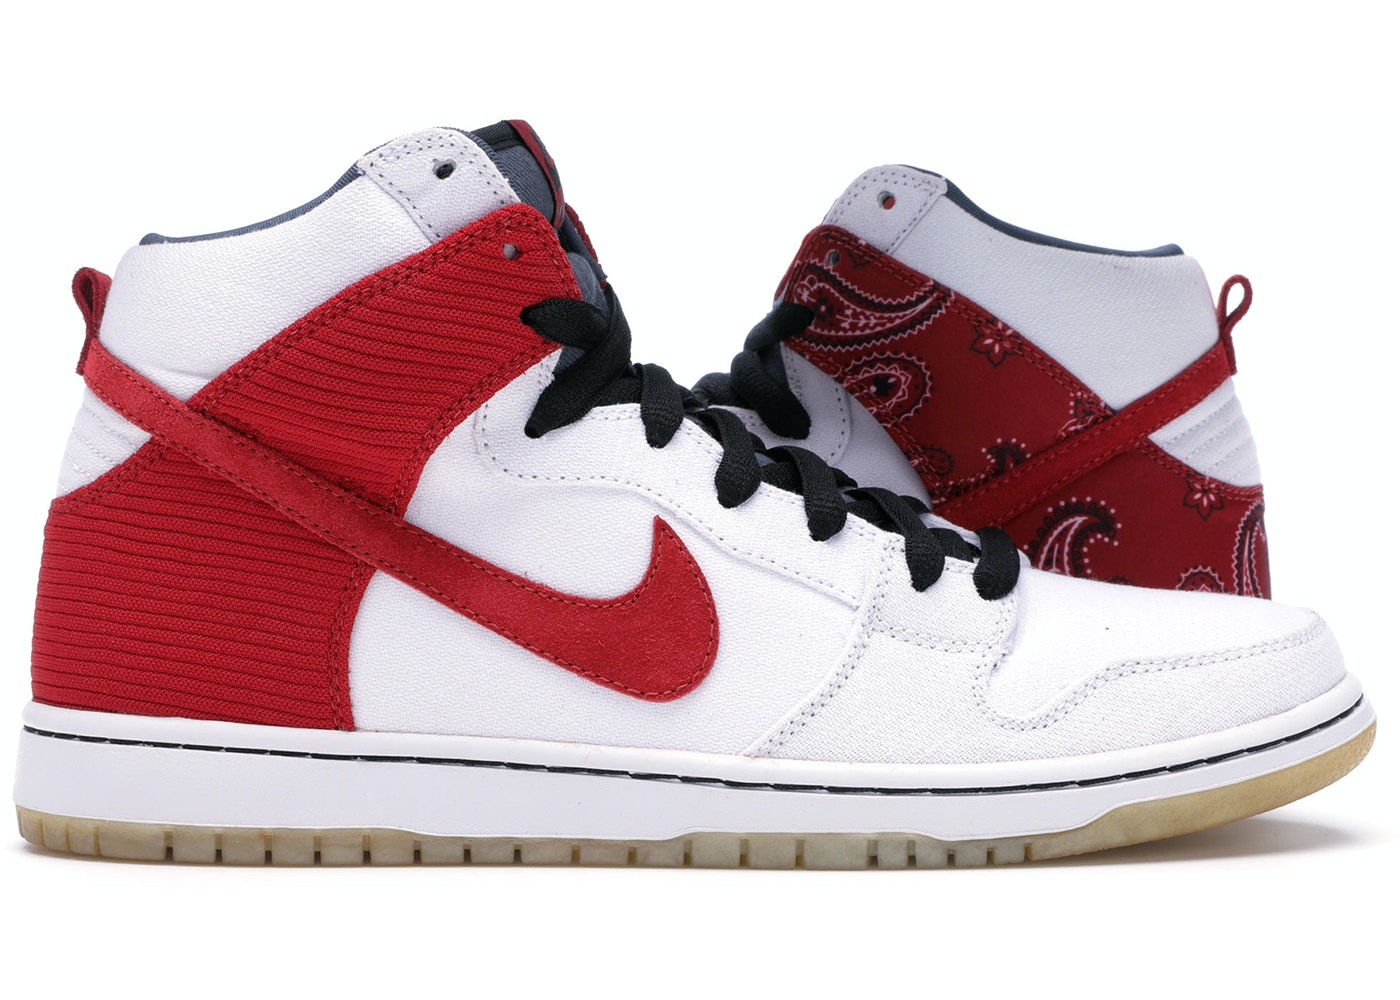 low priced 7d104 f5e12 Nike Dunk SB High Cheech & Chong